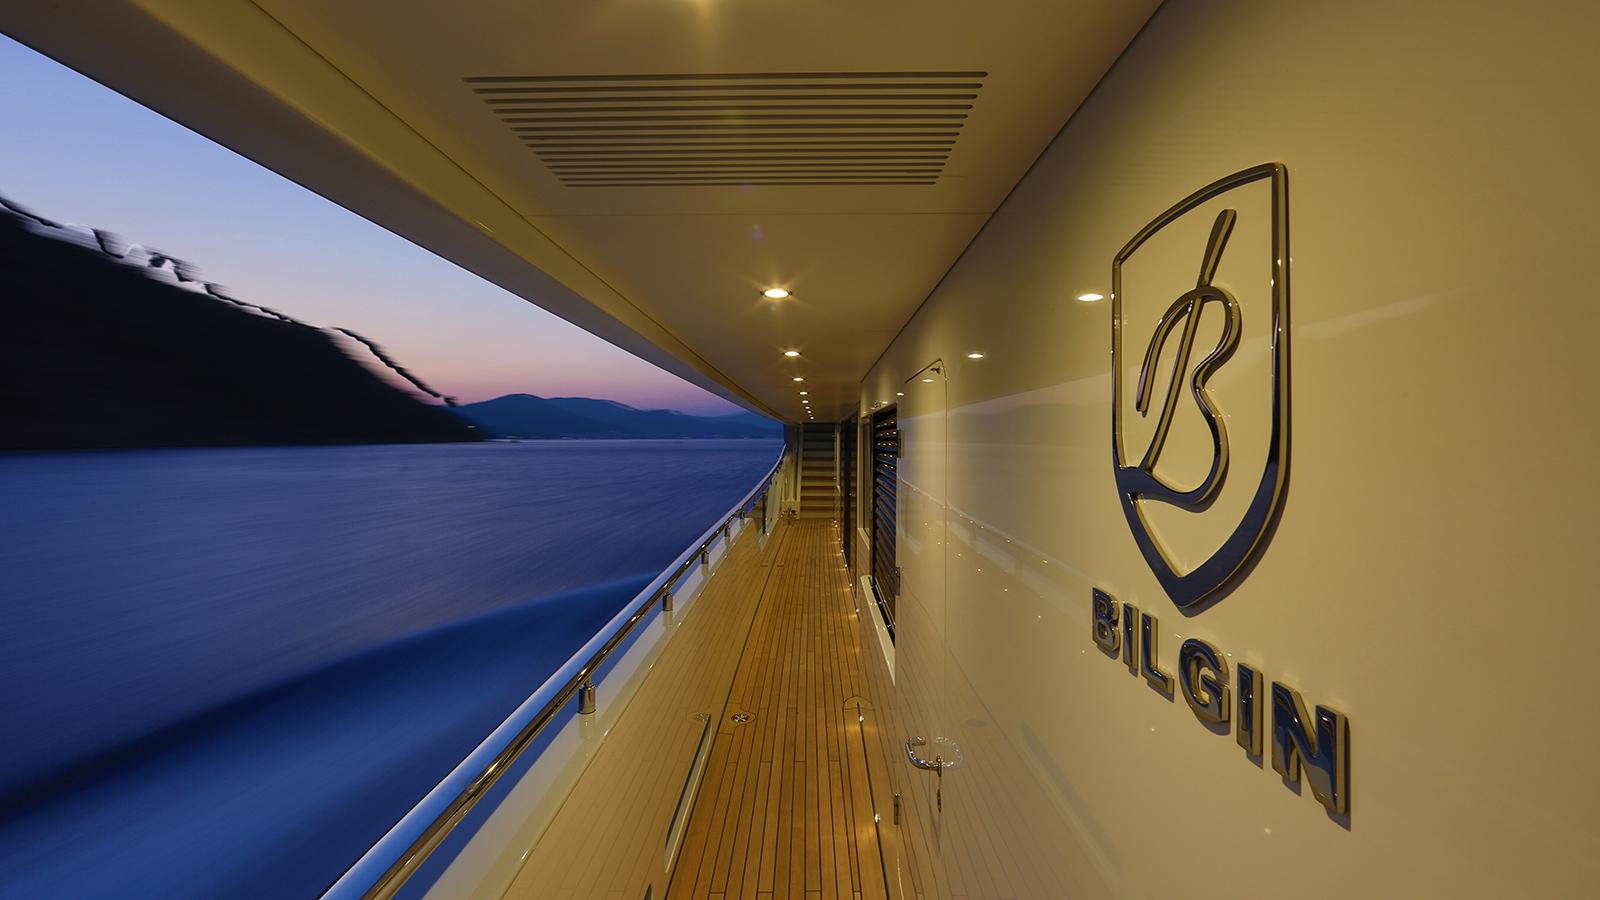 the-side-deck-of-the-bilgin-superyacht-giaola-lu